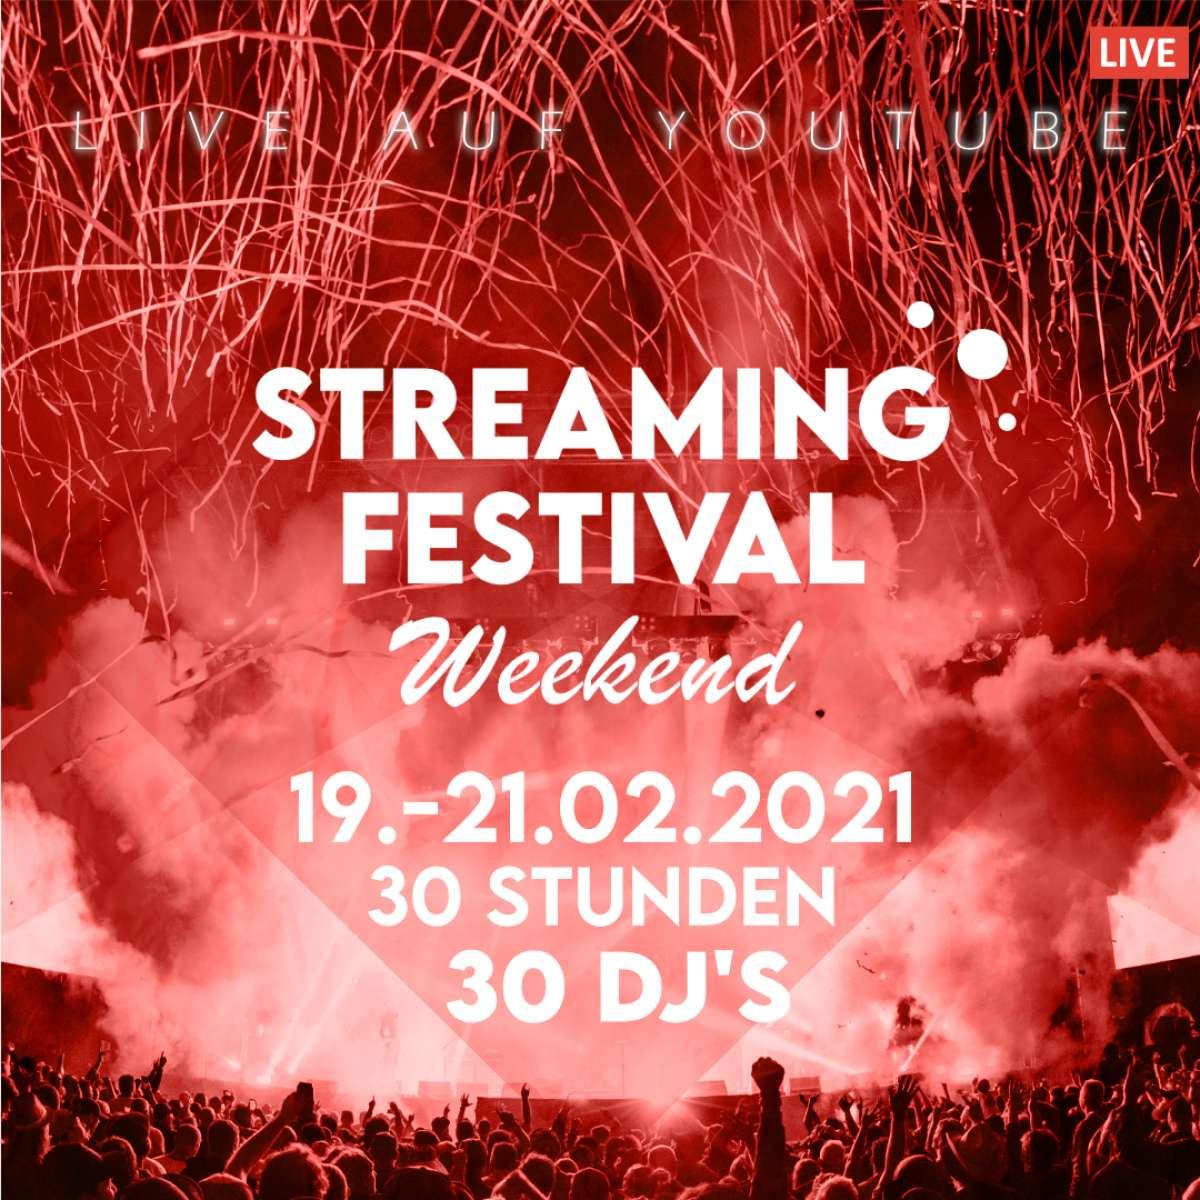 Streaming Festival Weekend - 30 Stunden, 30 DJs